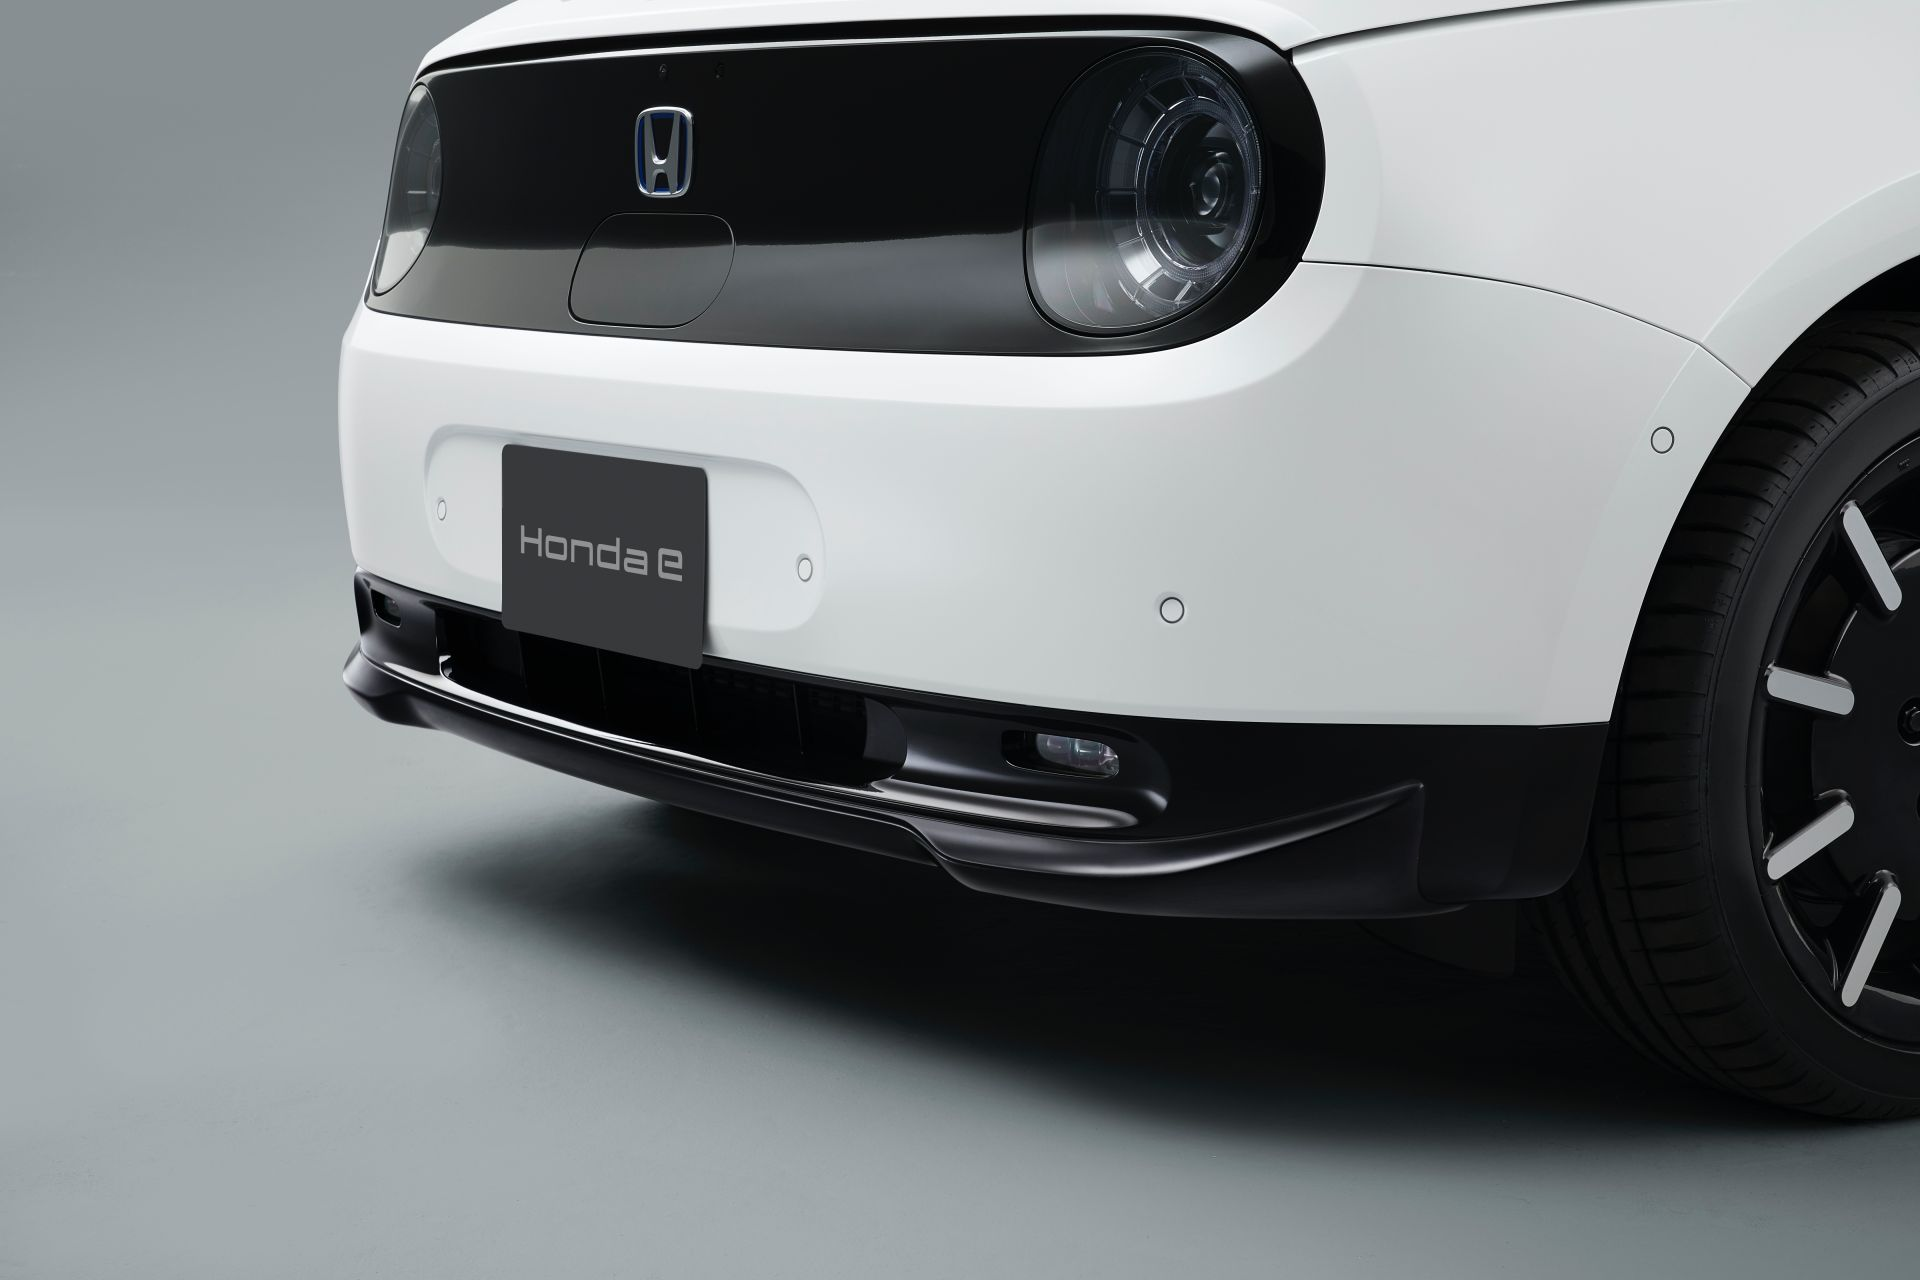 2021-Honda-e-genuine-accessories-JDM-spec-3